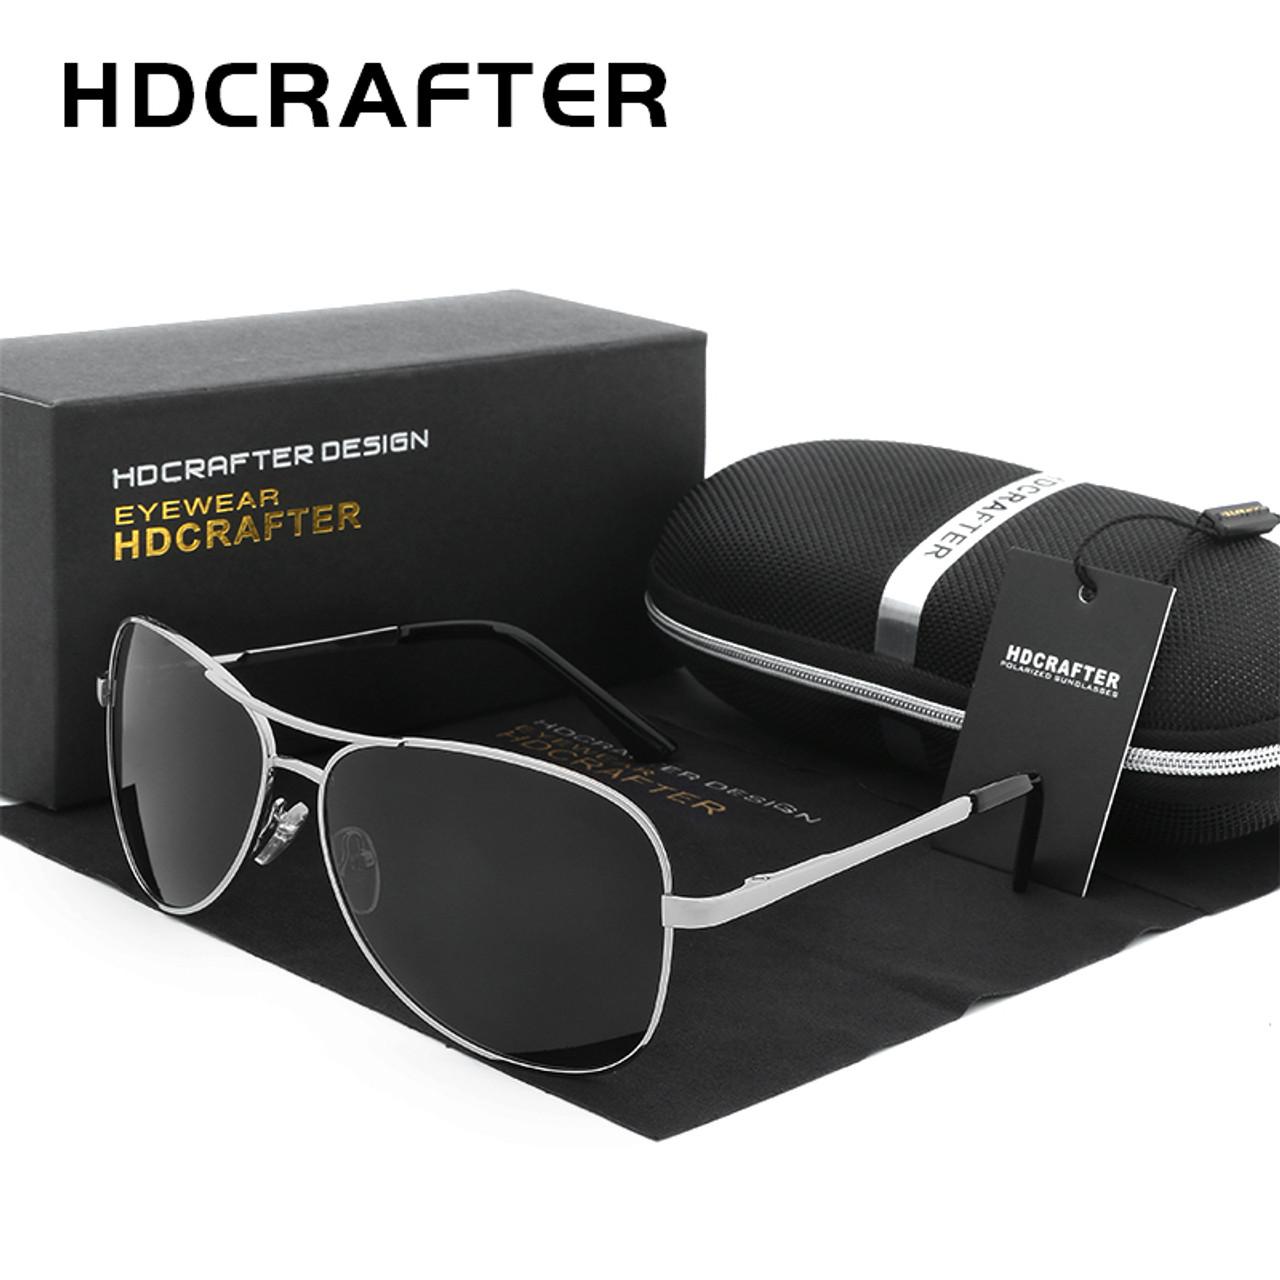 f1fac1d8ac HDCRAFTER Aviator Sunglasses Men Polarized Sun Glasses For Men fashion UV400  driving outdoor sunglasses with box ...